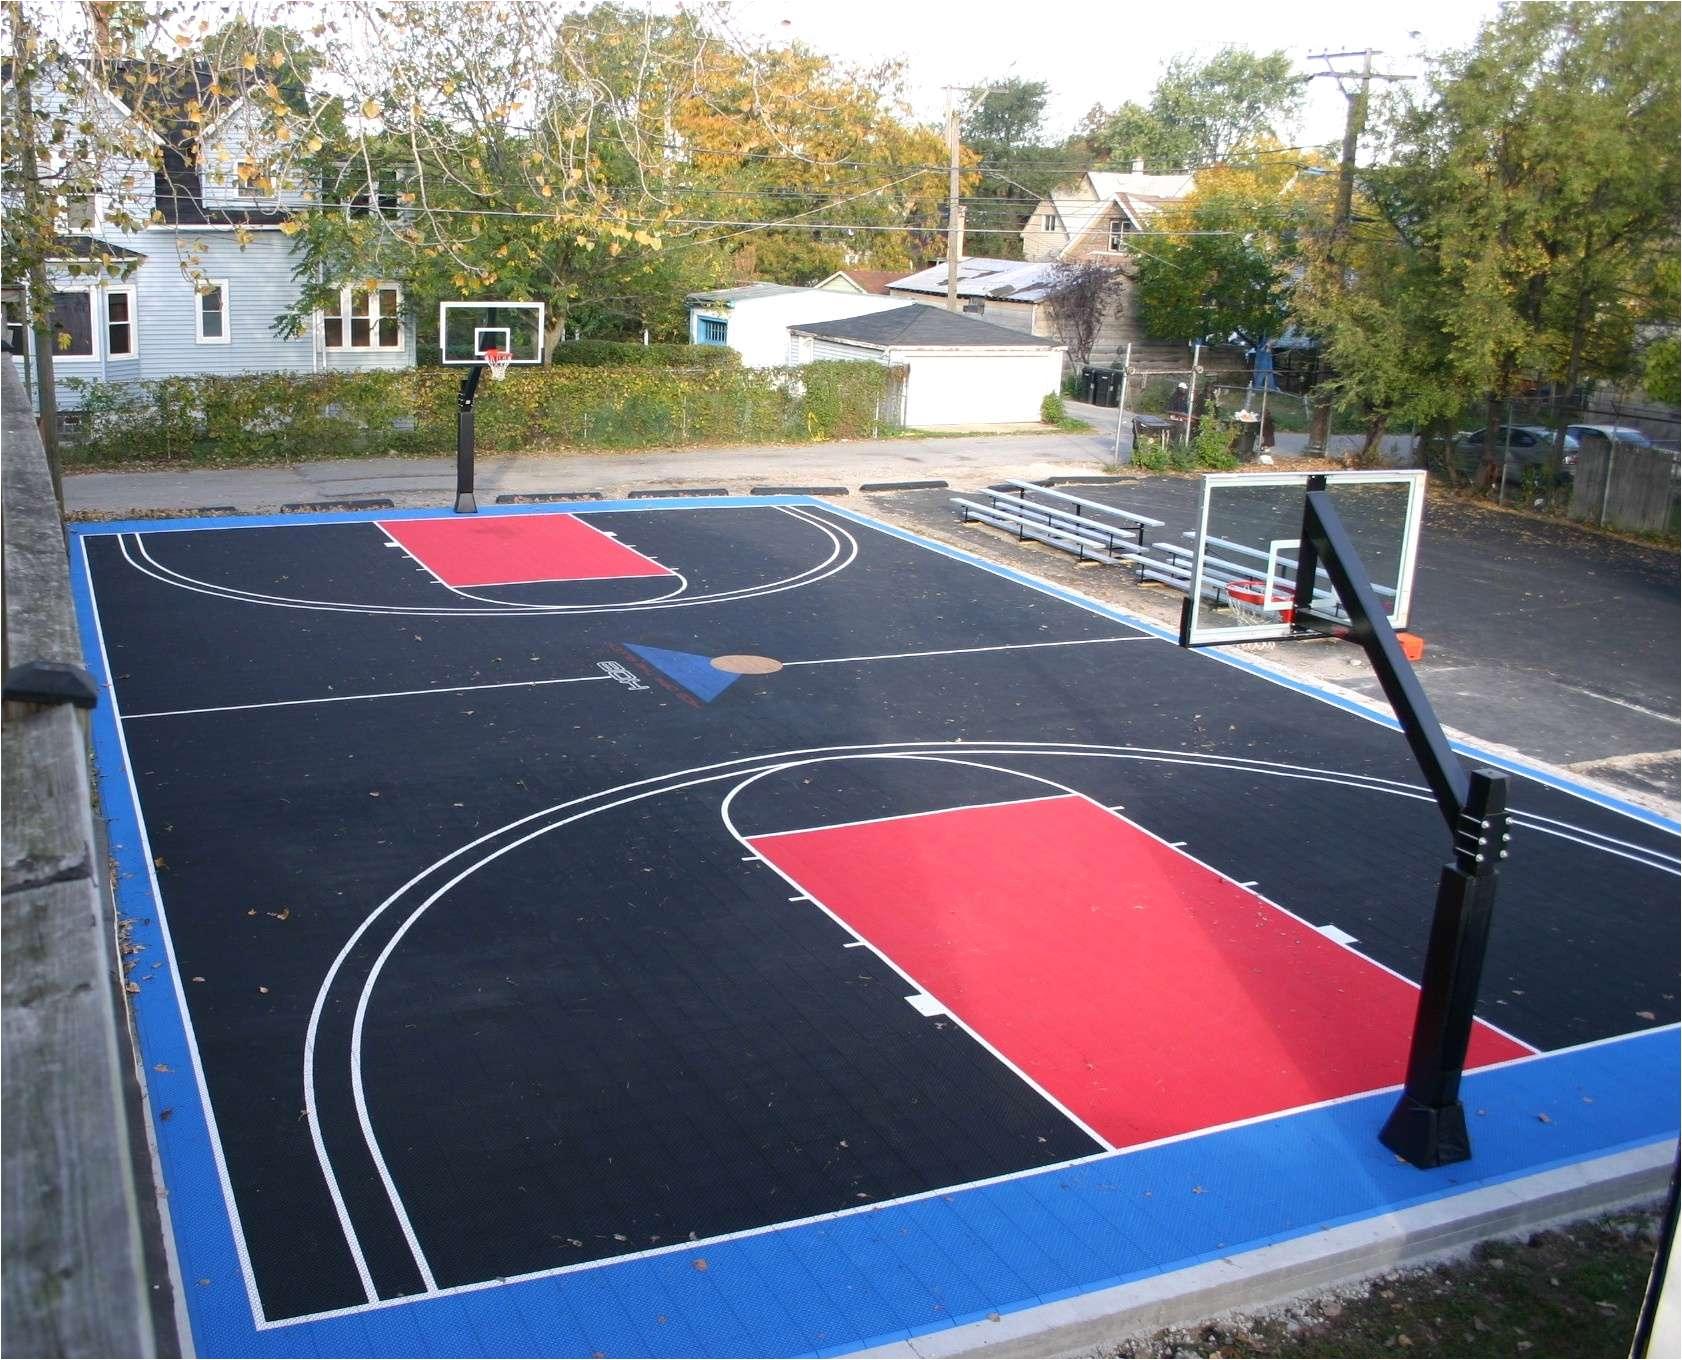 backyard basketball court paving inspirational how much does an indoor basketball court cost new basketball court